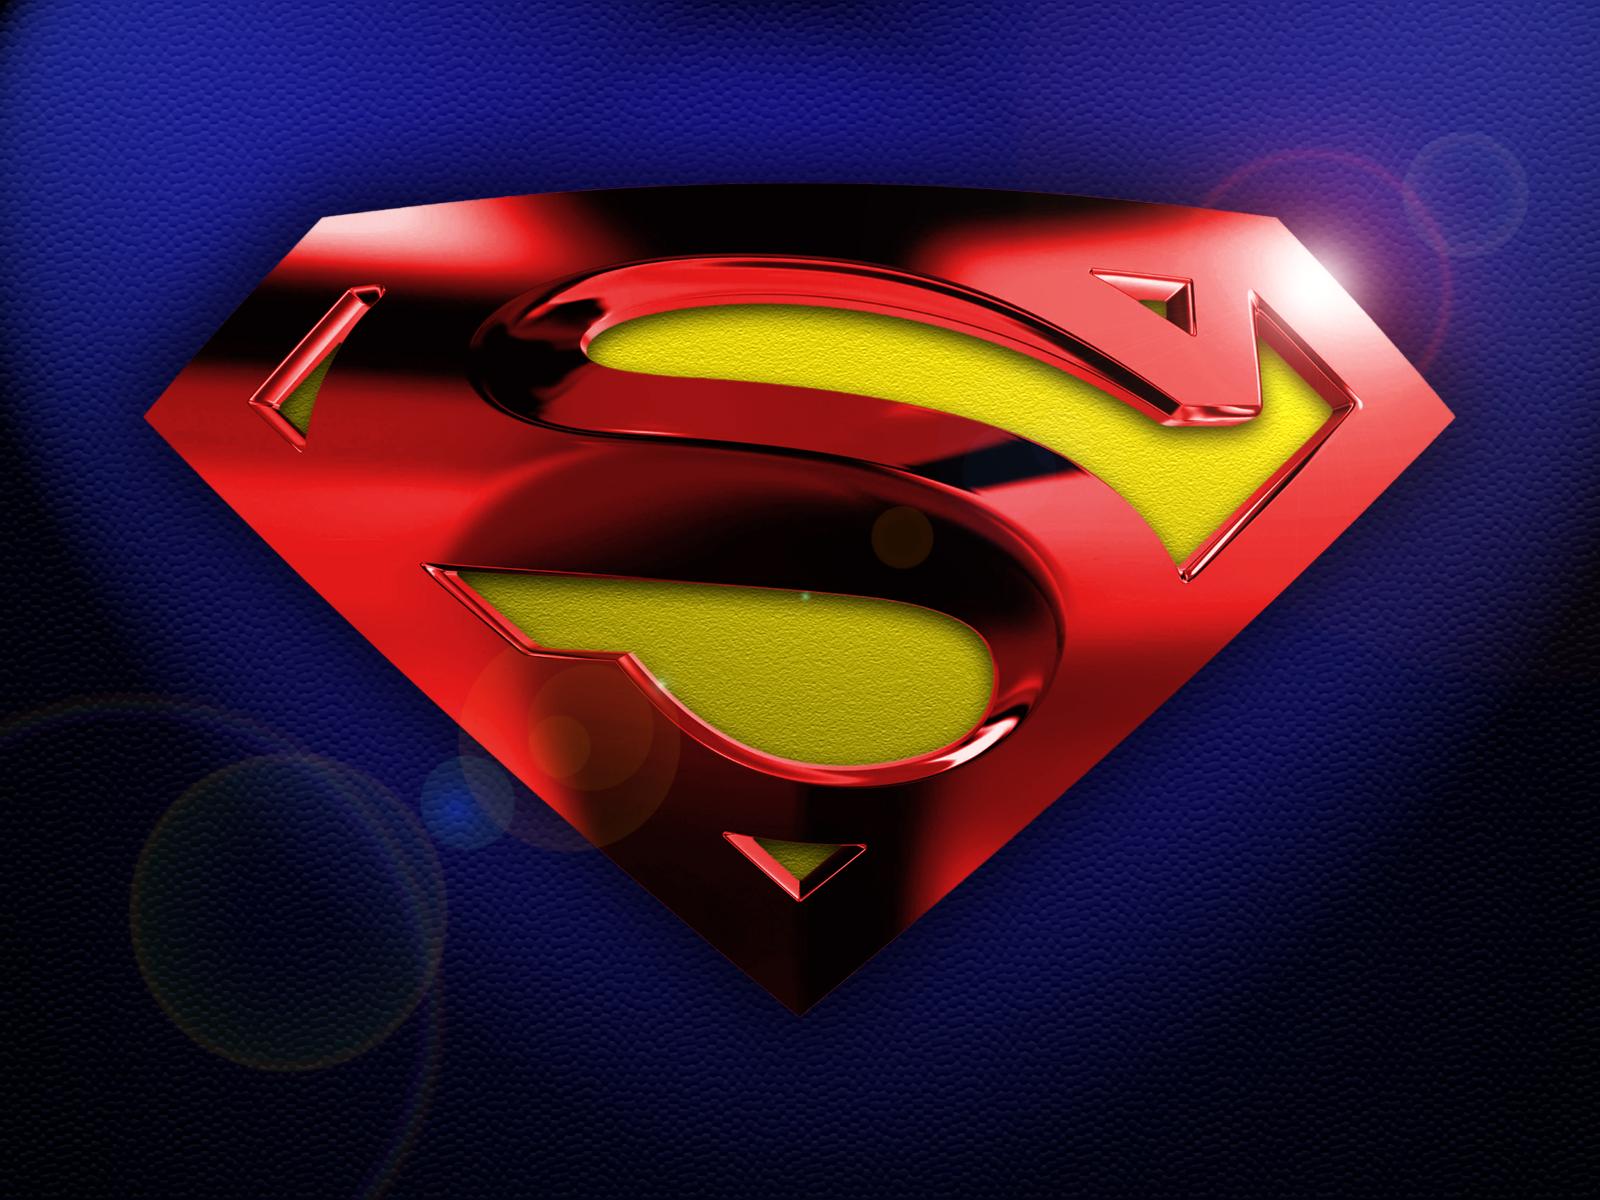 superman wallpaper hd waka 2 reality wallpapers superman wallpaper hd 1600x1200